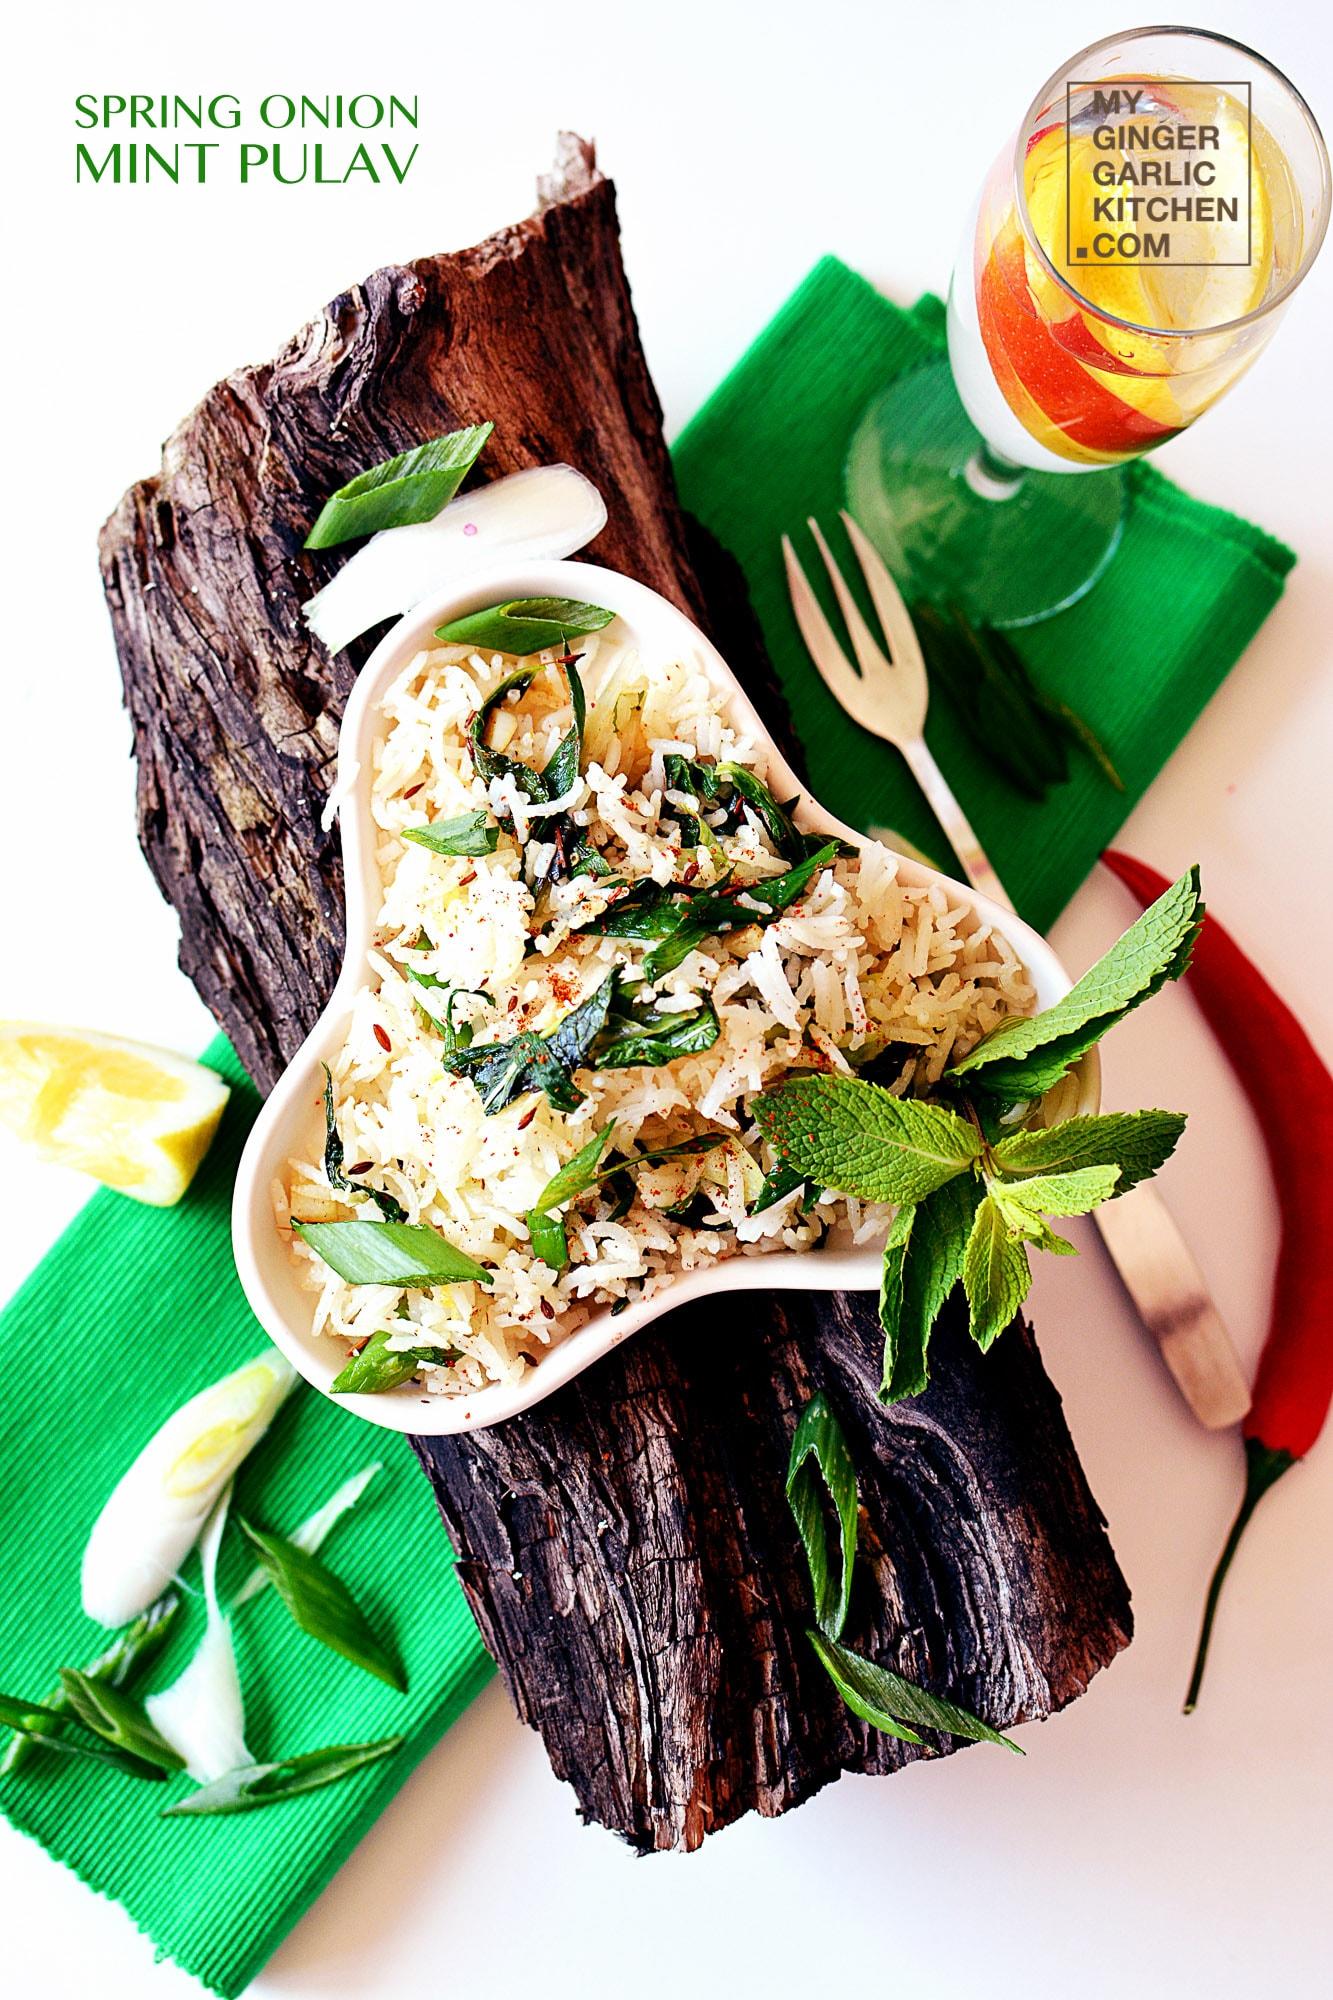 Image - recipe spring onion mint pulav anupama paliwal my ginger garlic kitchen 4